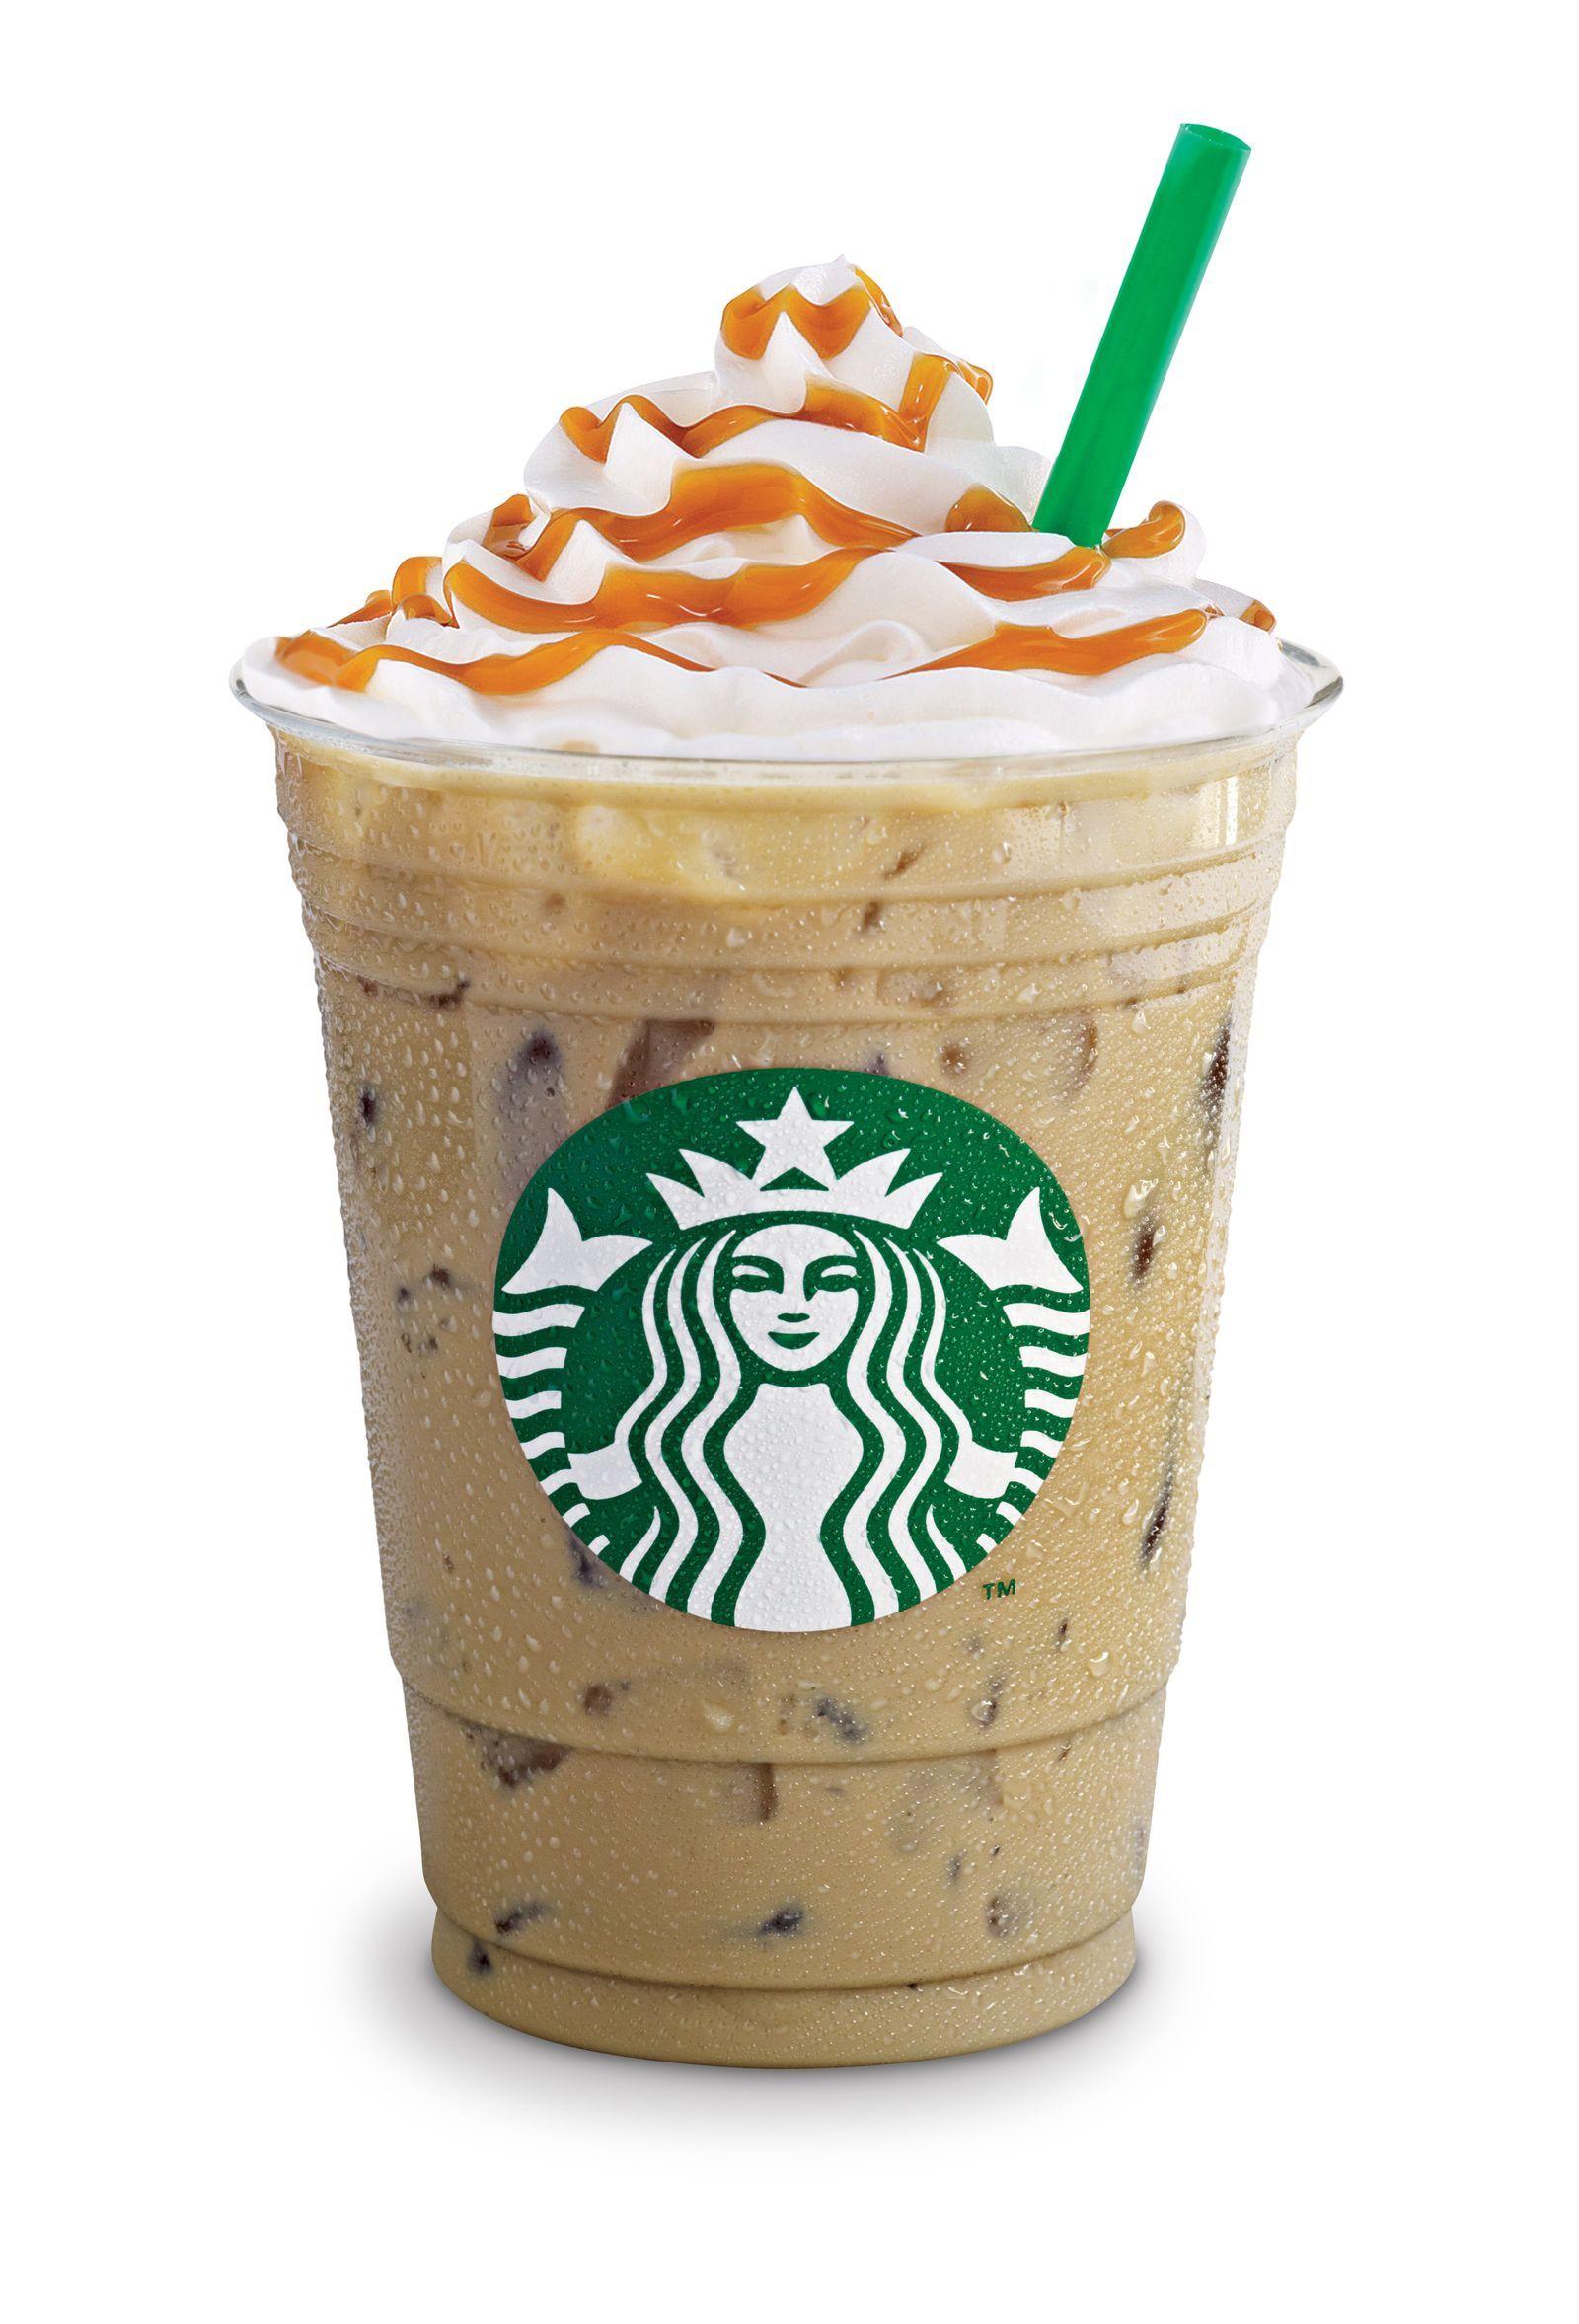 15 Most Amazing Starbucks Drinks Around the World in 2020